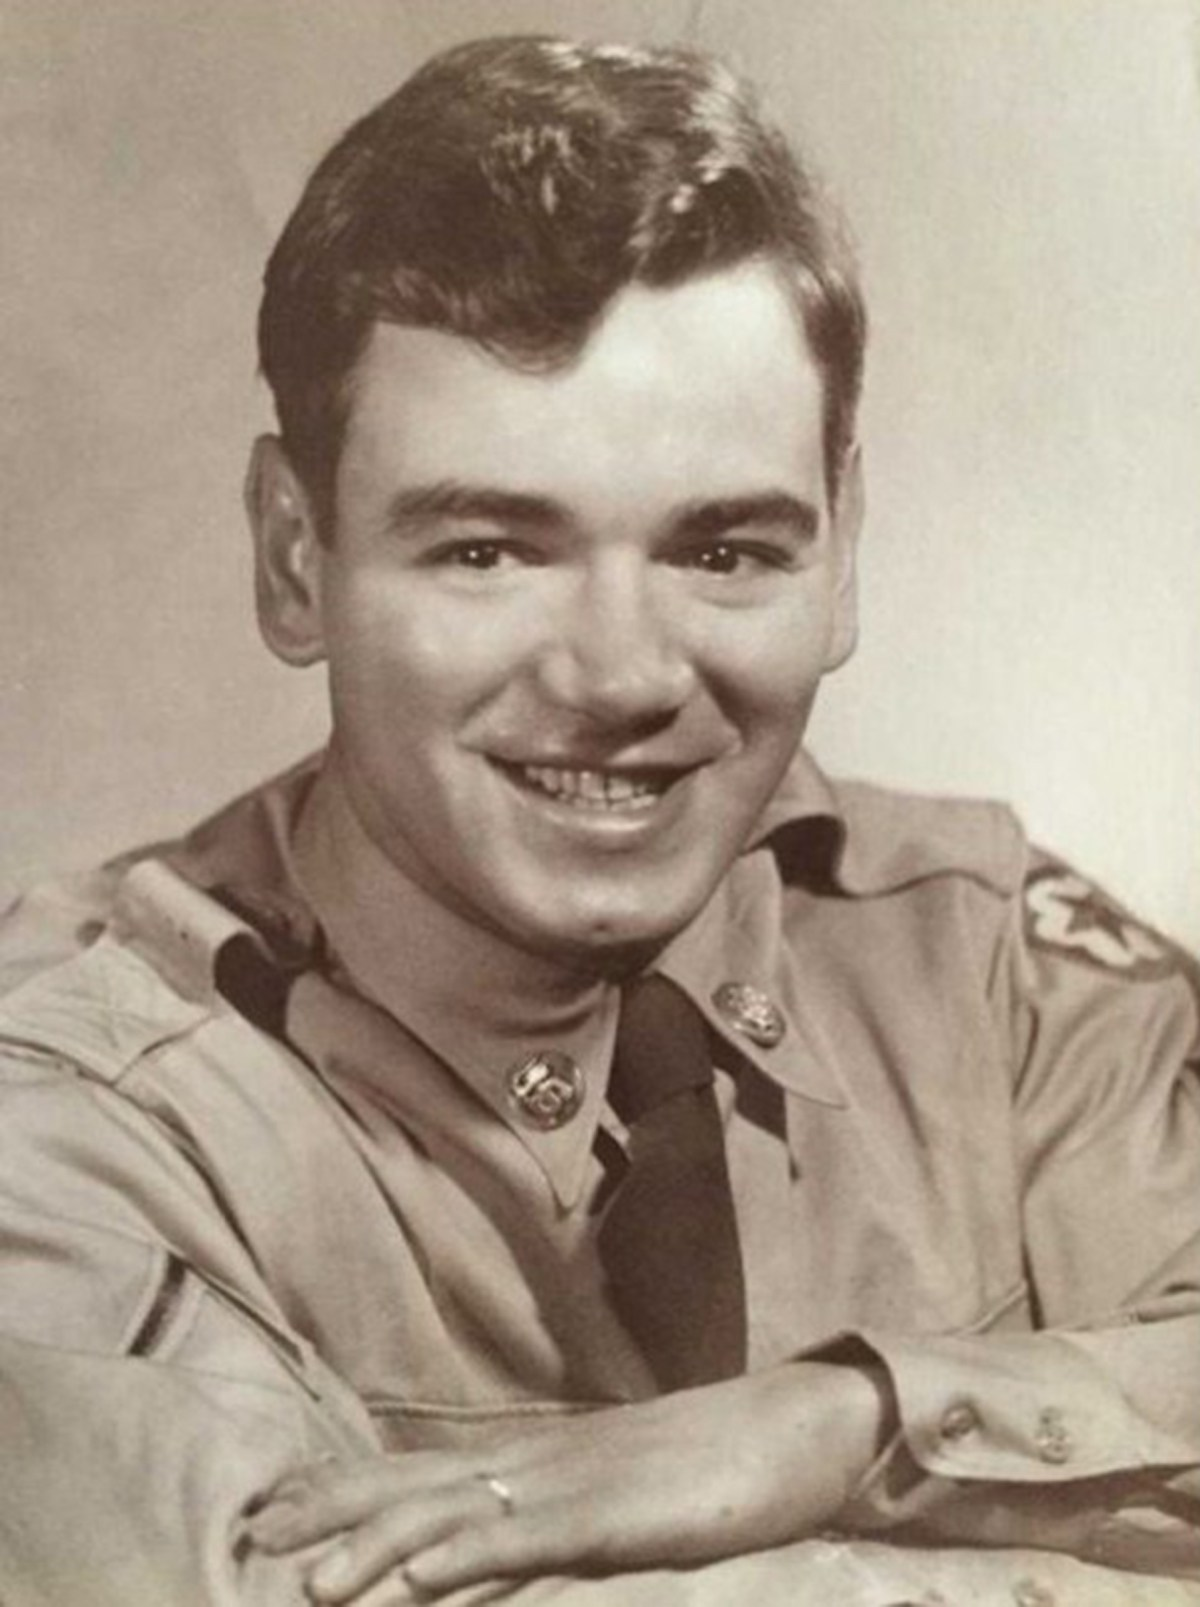 Military photo of Charles Correia.